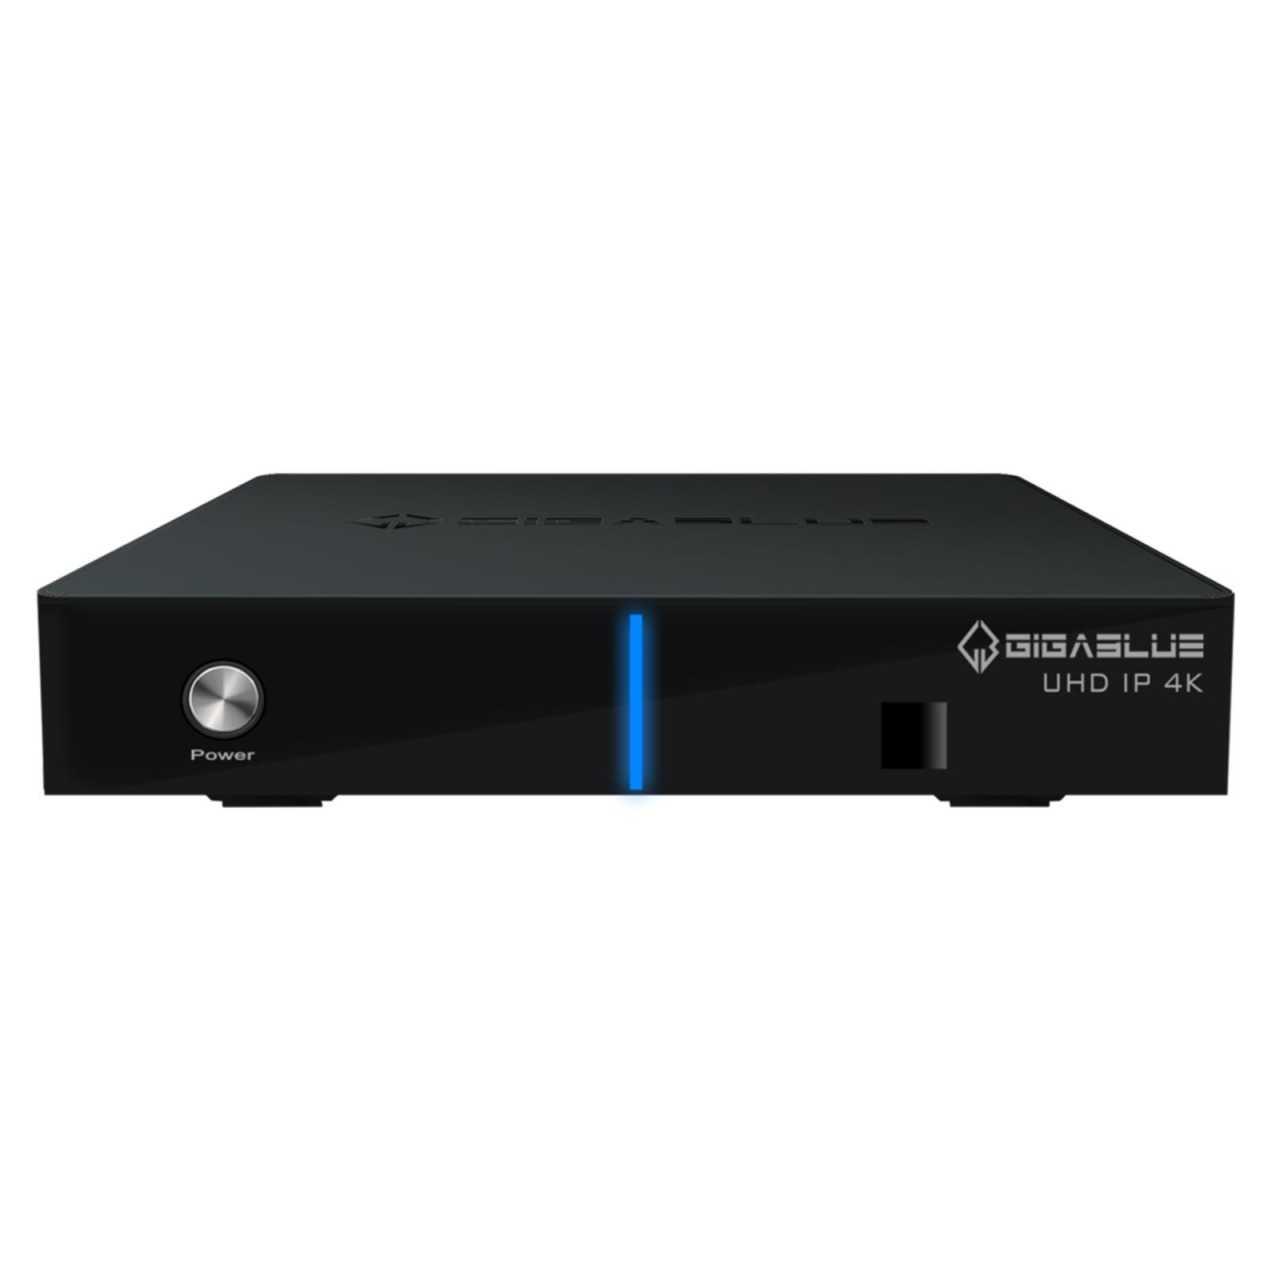 GigaBlue UHD IP 4K USB HDMI SD Karte Multiroom Ultra HD IP Box Receiver Schwarz RECGIG040